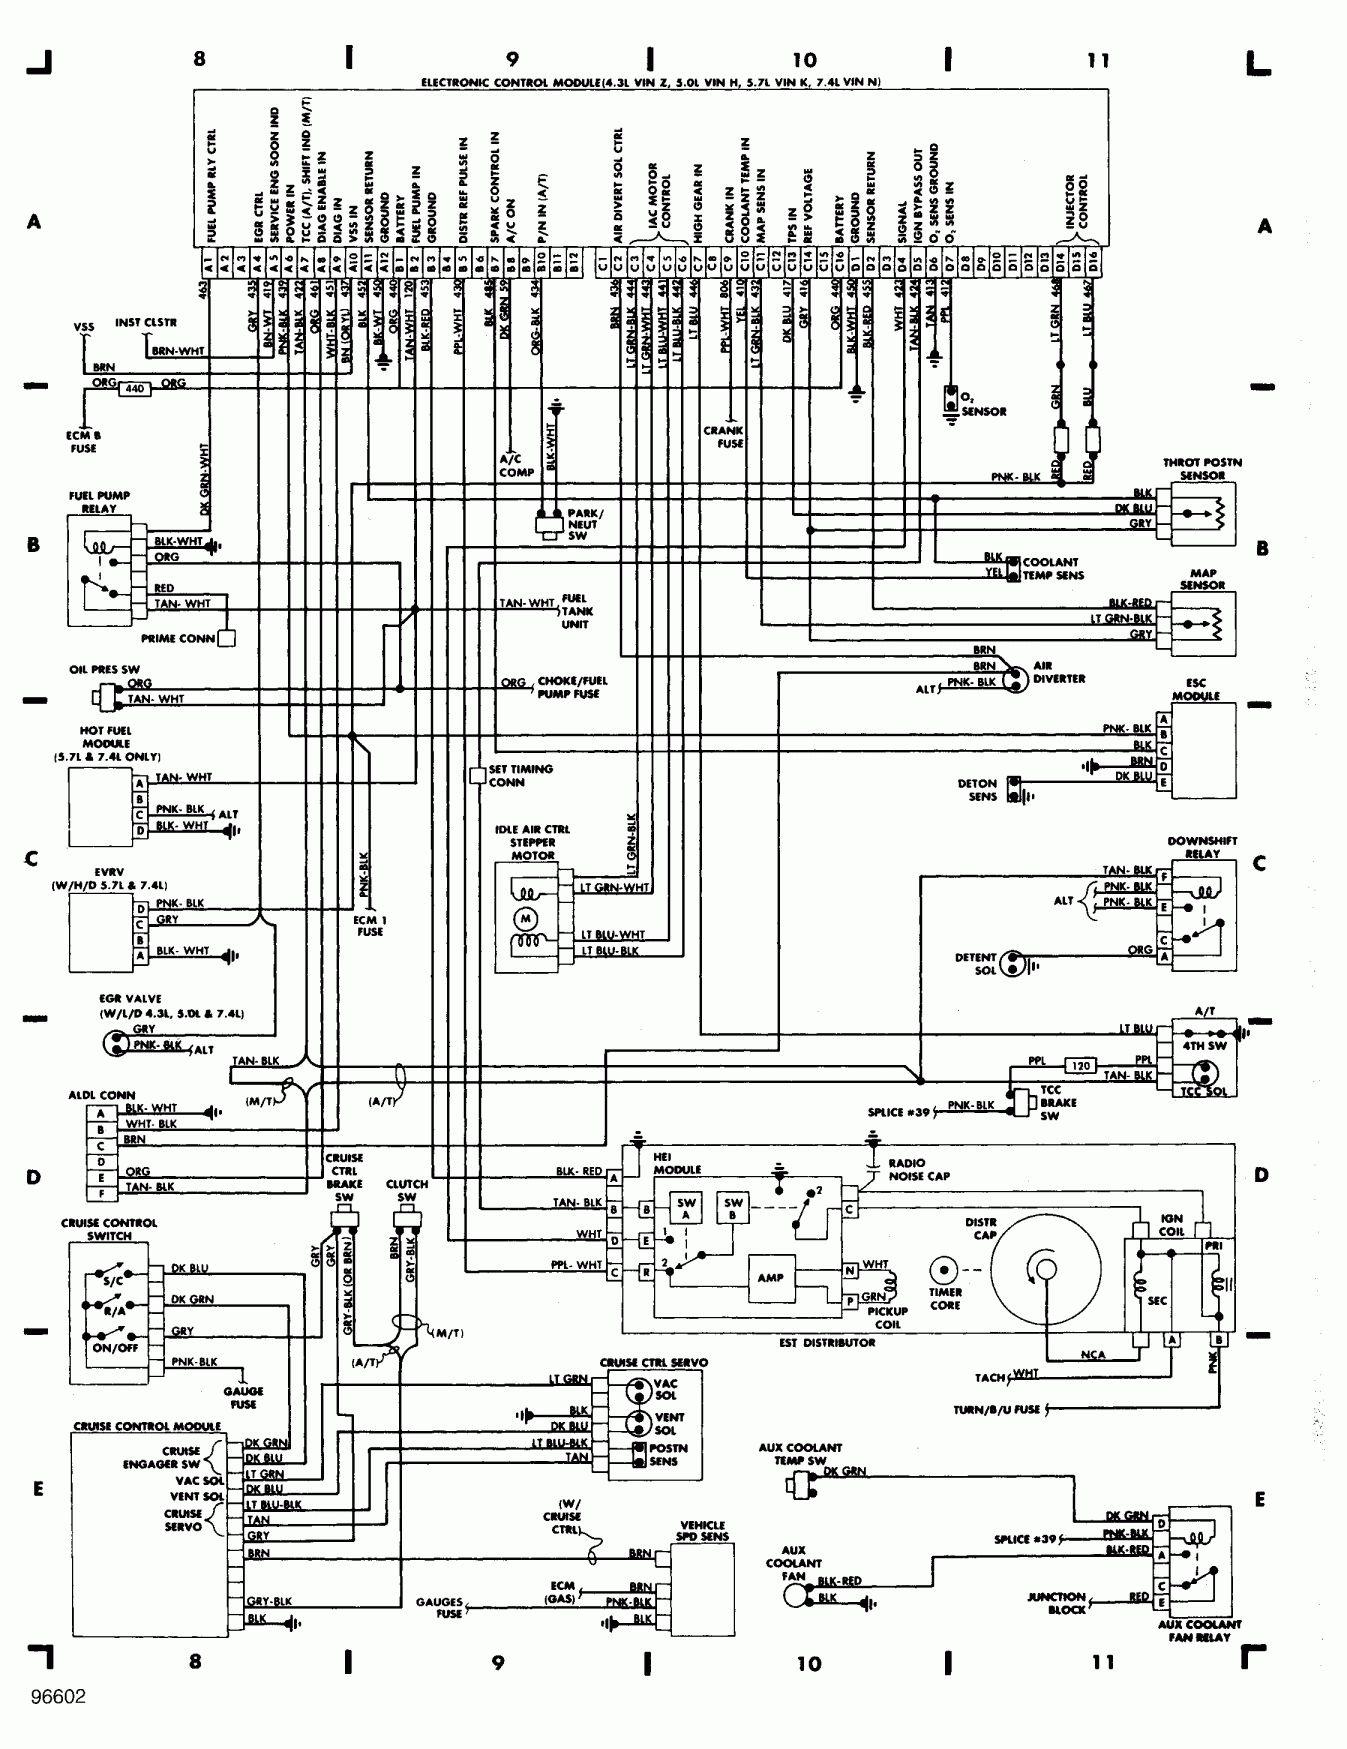 [QNCB_7524]  12+ 87 Chevy Truck Alternator Wiring Diagram - Truck Diagram - Wiringg.net  in 2020 | Toyota corolla, Chevy trucks, Chevy | Wiring Diagram For 87 Nissan Truck |  | Pinterest